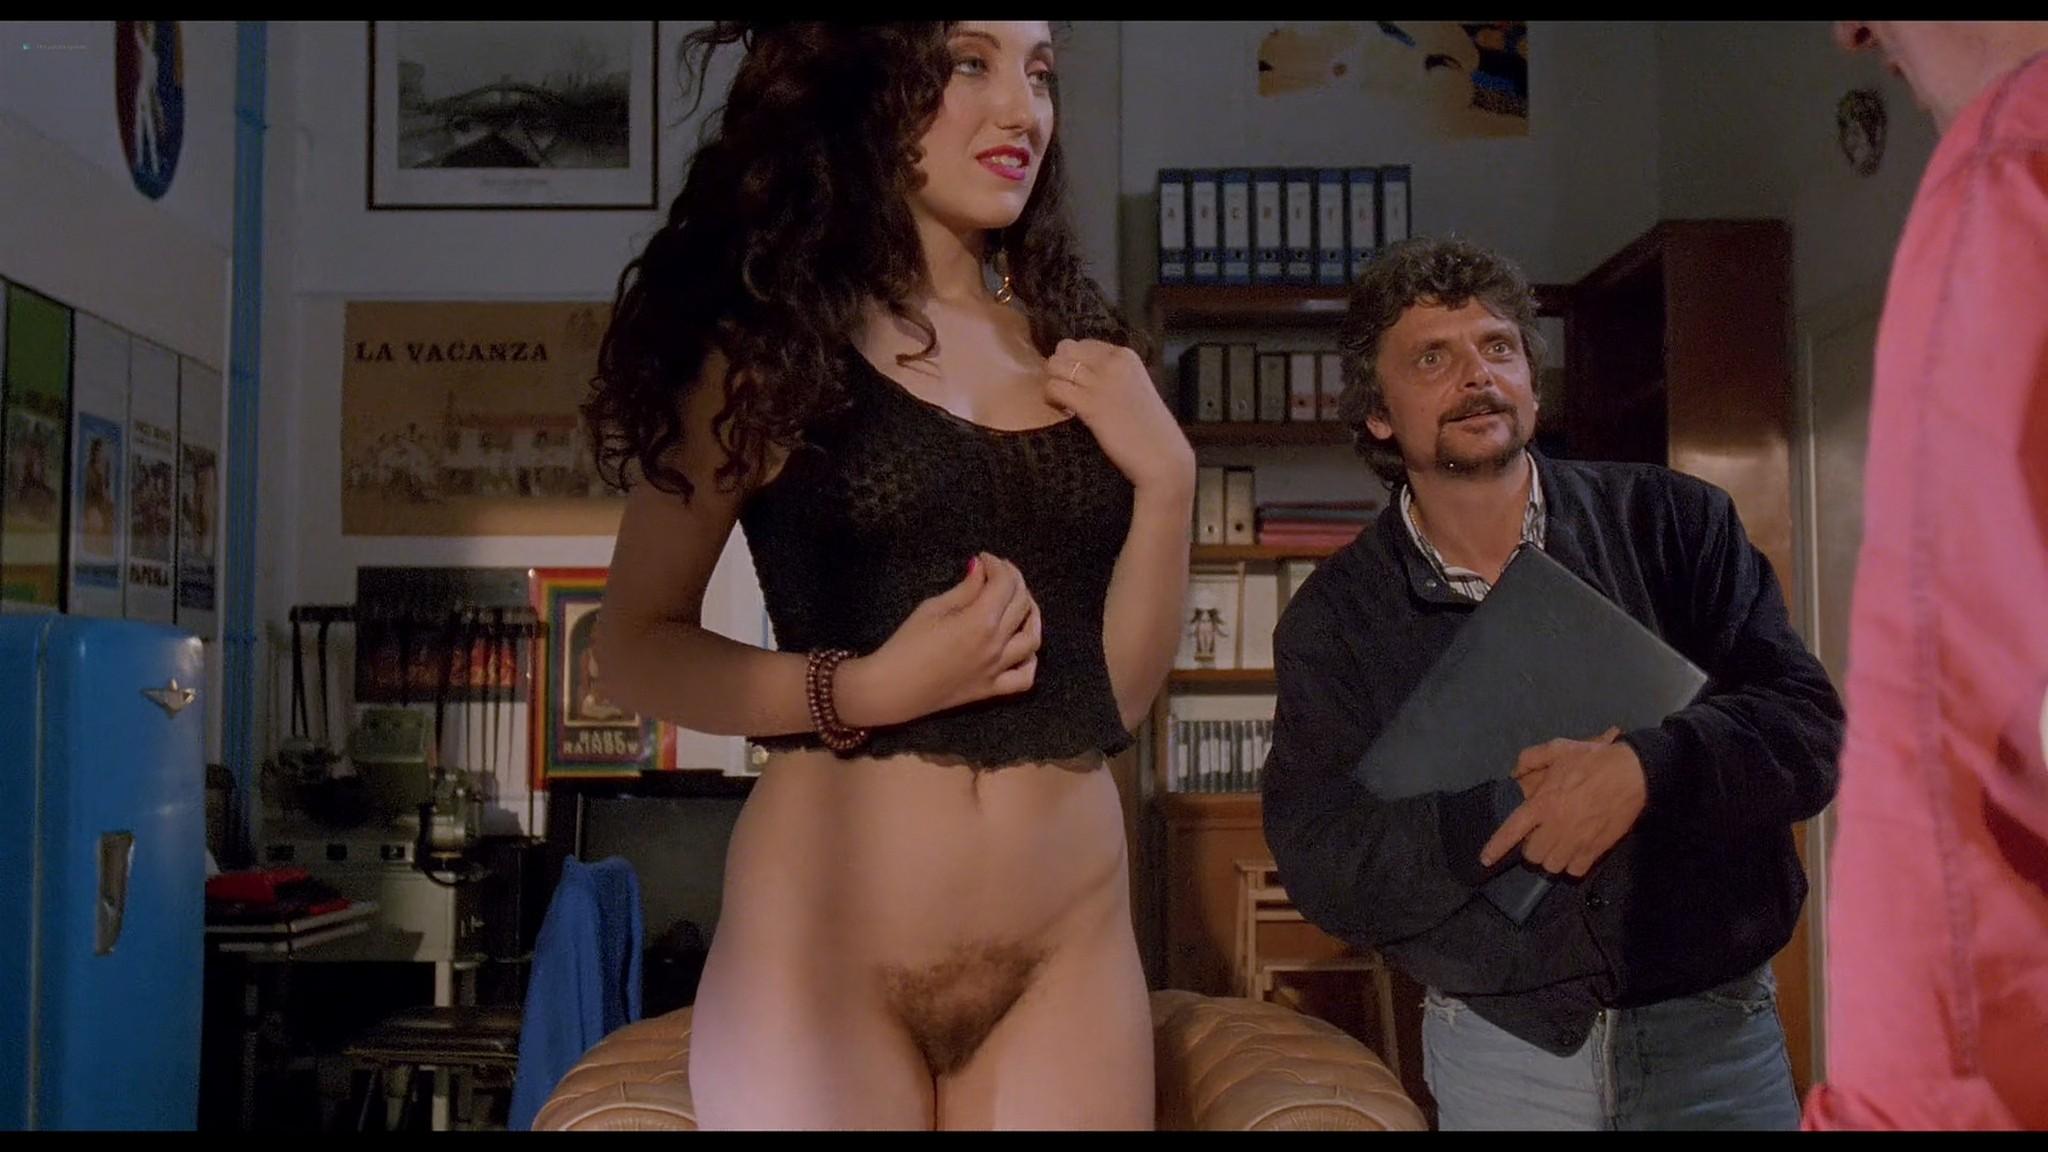 Cinzia Roccaforte nude explicit Erika Savastani and other nude sex explicit Fermo posta Tinto Brass 1995 HD 1080p BluRay 018